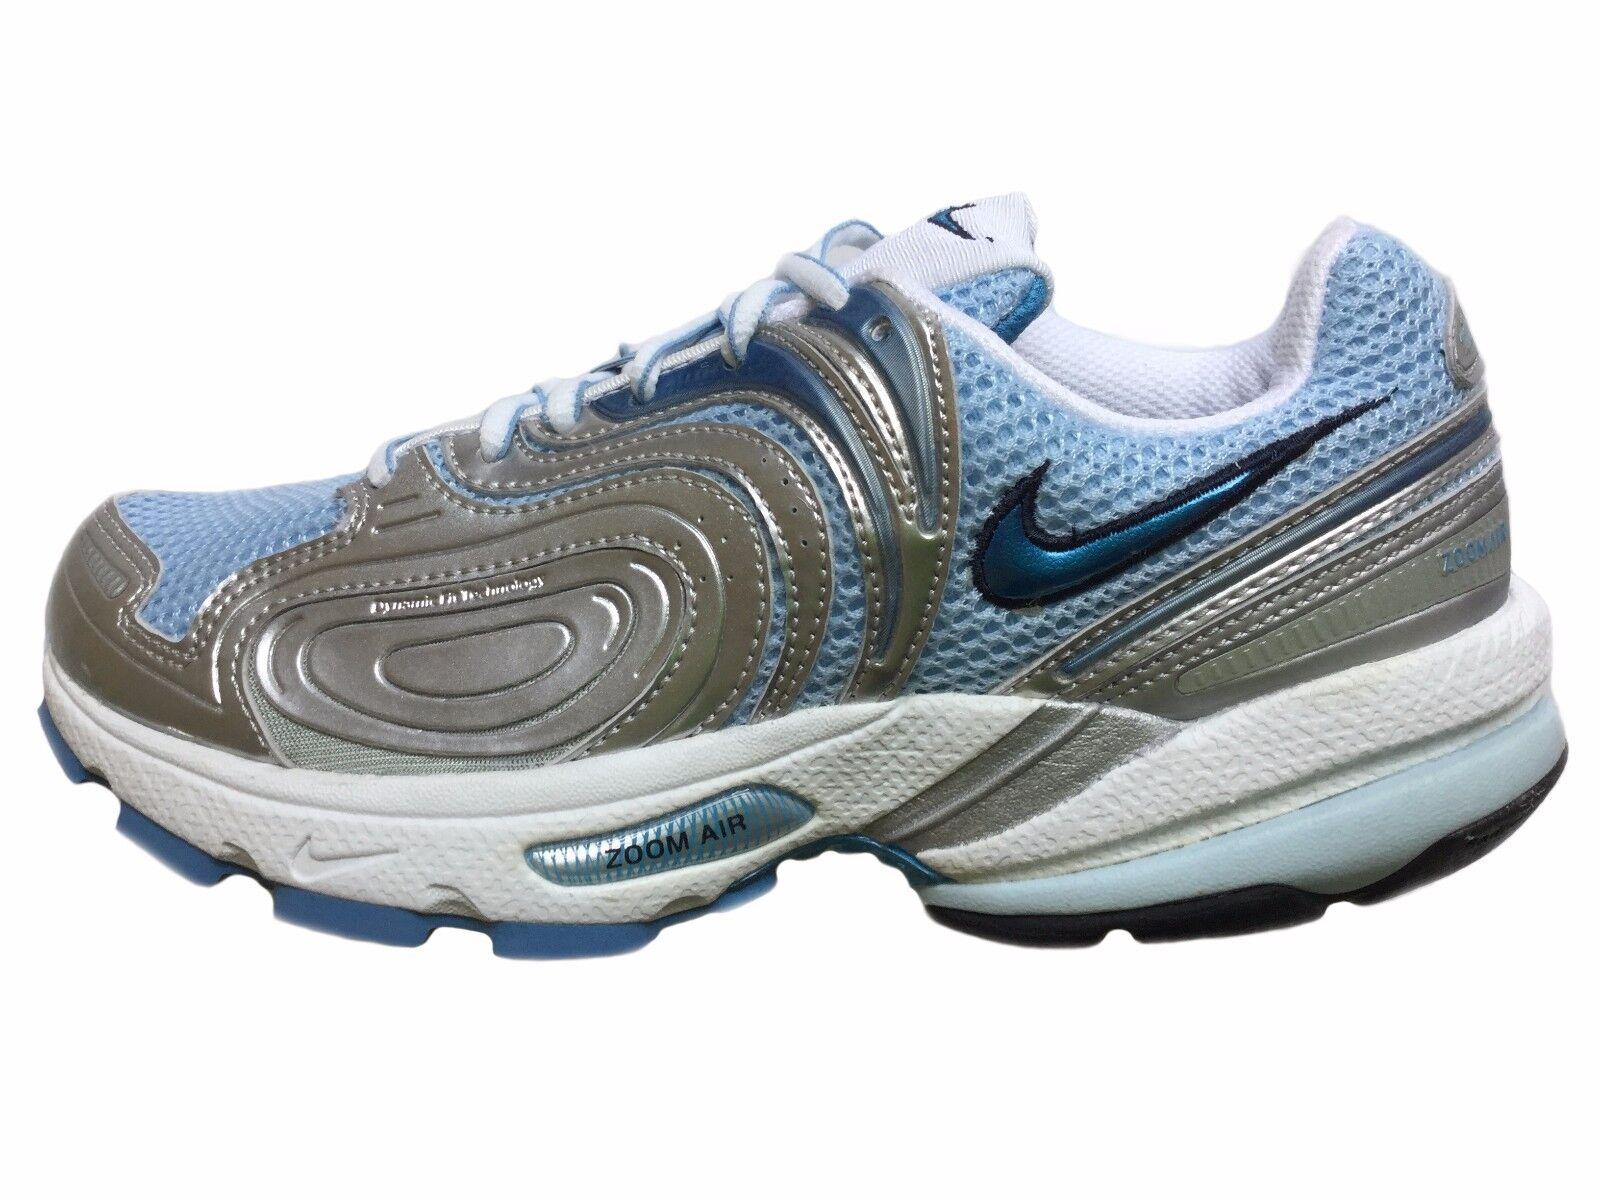 Nike air zoom percept donne allenatori - 312519 441 441 441 -     25 cm | Acquisti  e4f23d